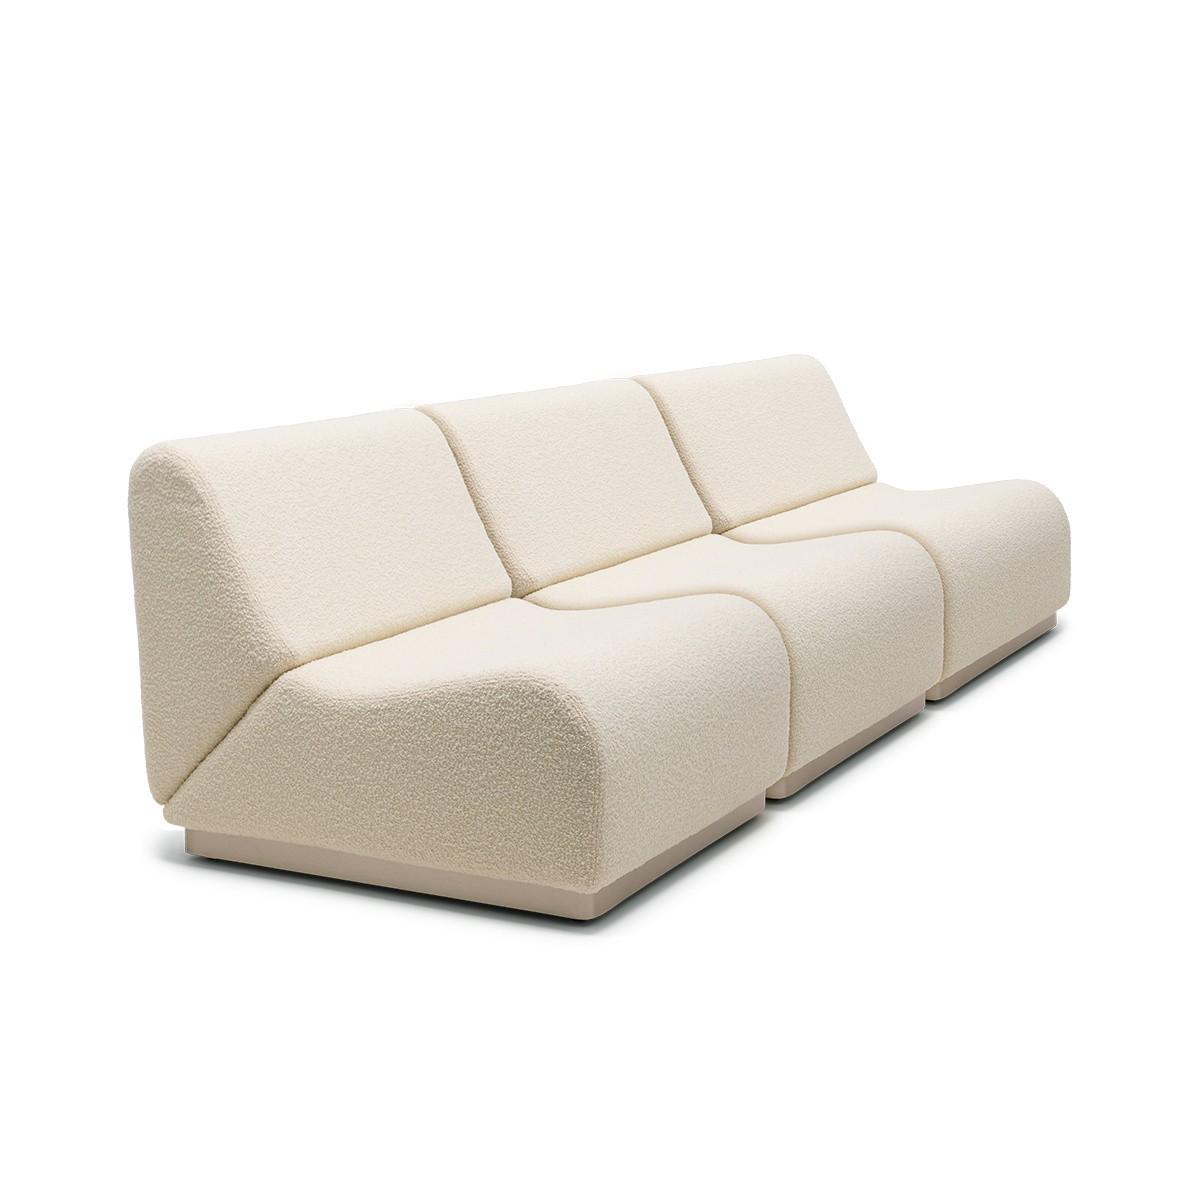 Rotondo modular sofa in cream white curly wool